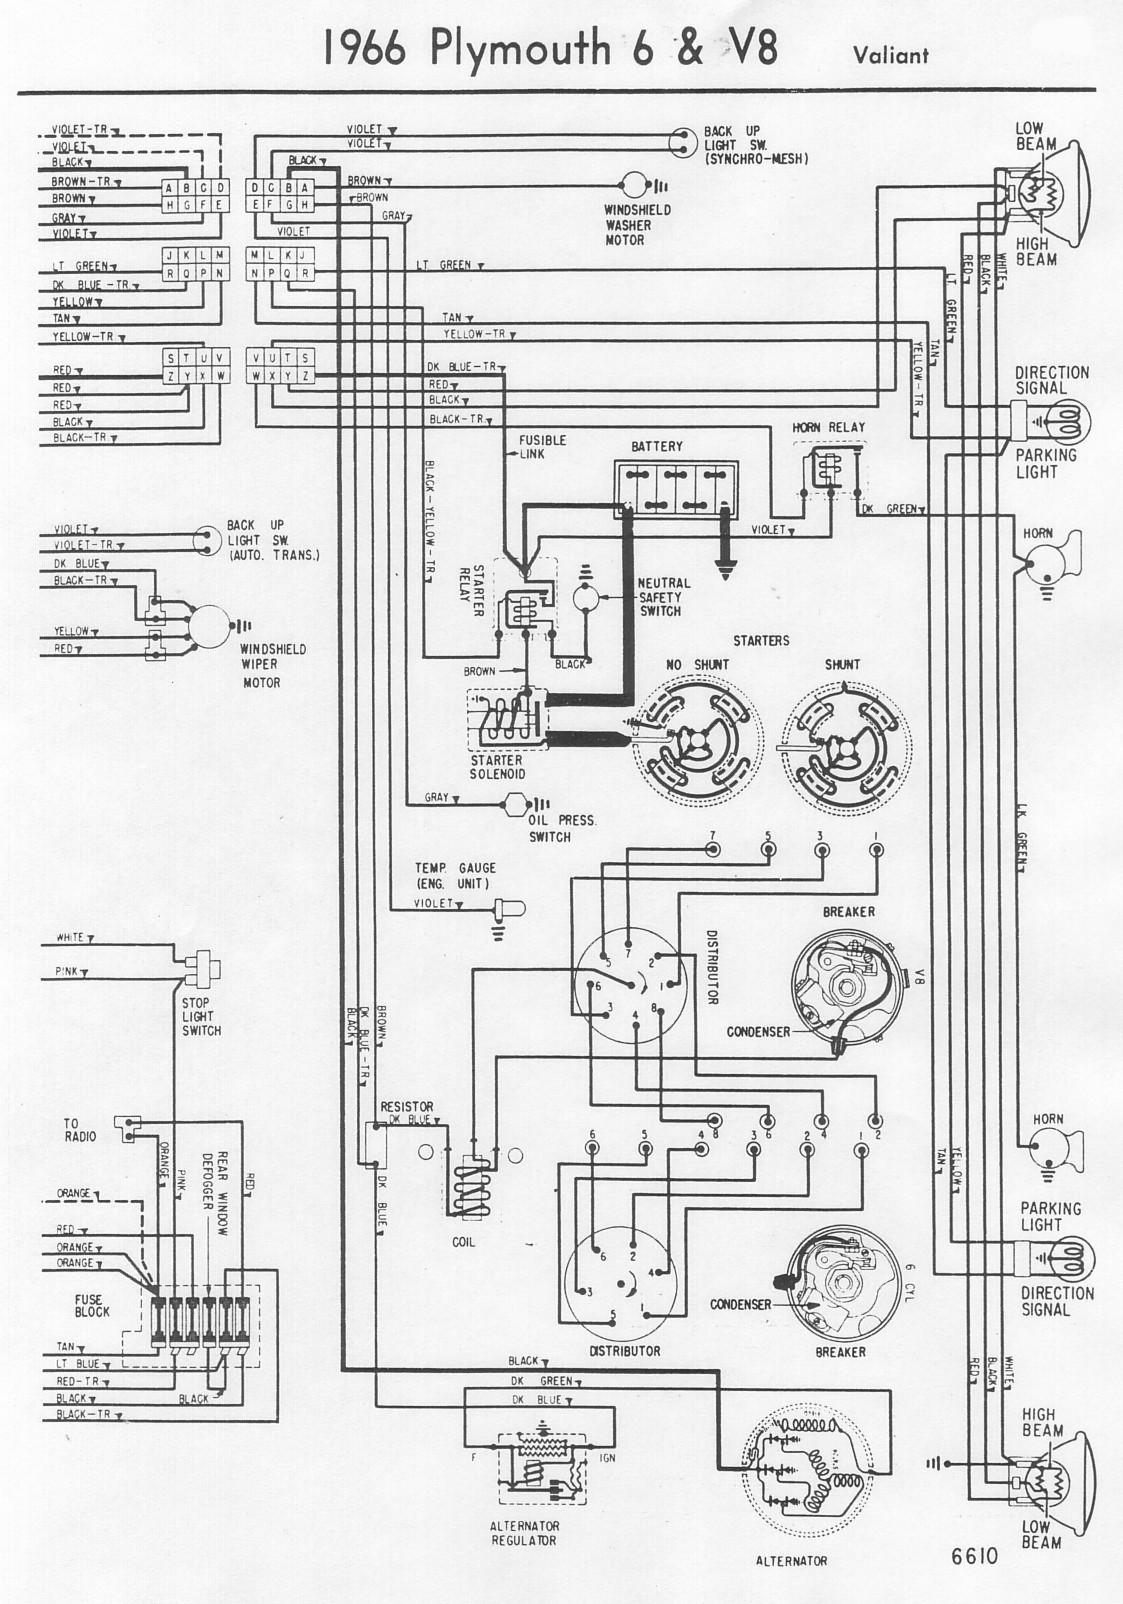 2000 Honda Rancher Wiring Diagram - Wiring Diagram